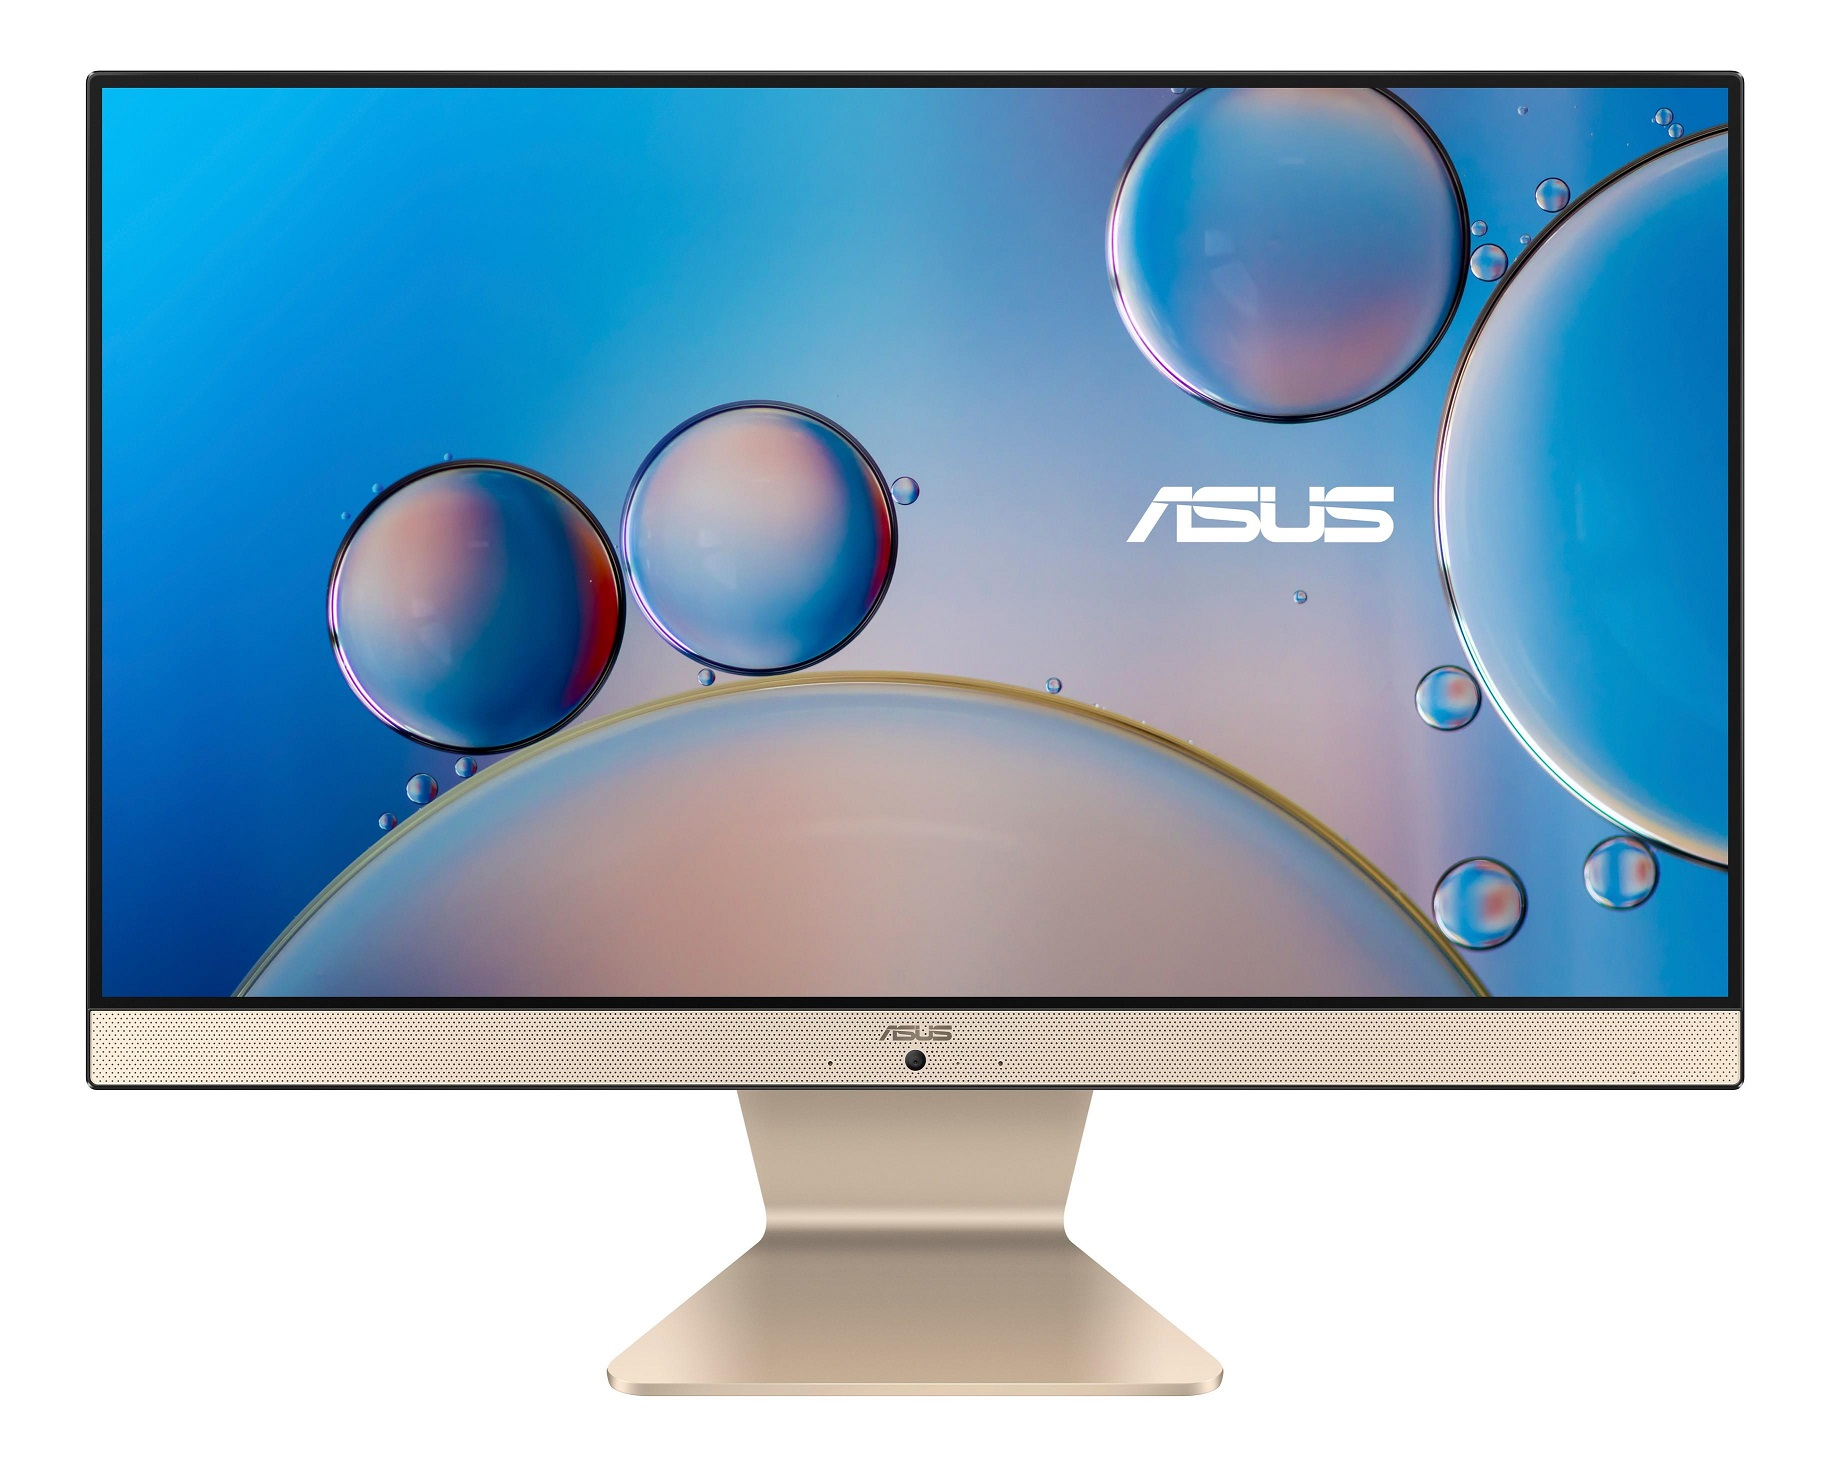 ASUS VIVO AIO M3200/21,5''/R5-5500U (6C/12T)/8GB/512GB SSD/WIFI+BT/KL+M/W10H/Gold/2Y PUR - M3200WUAK-BA016T